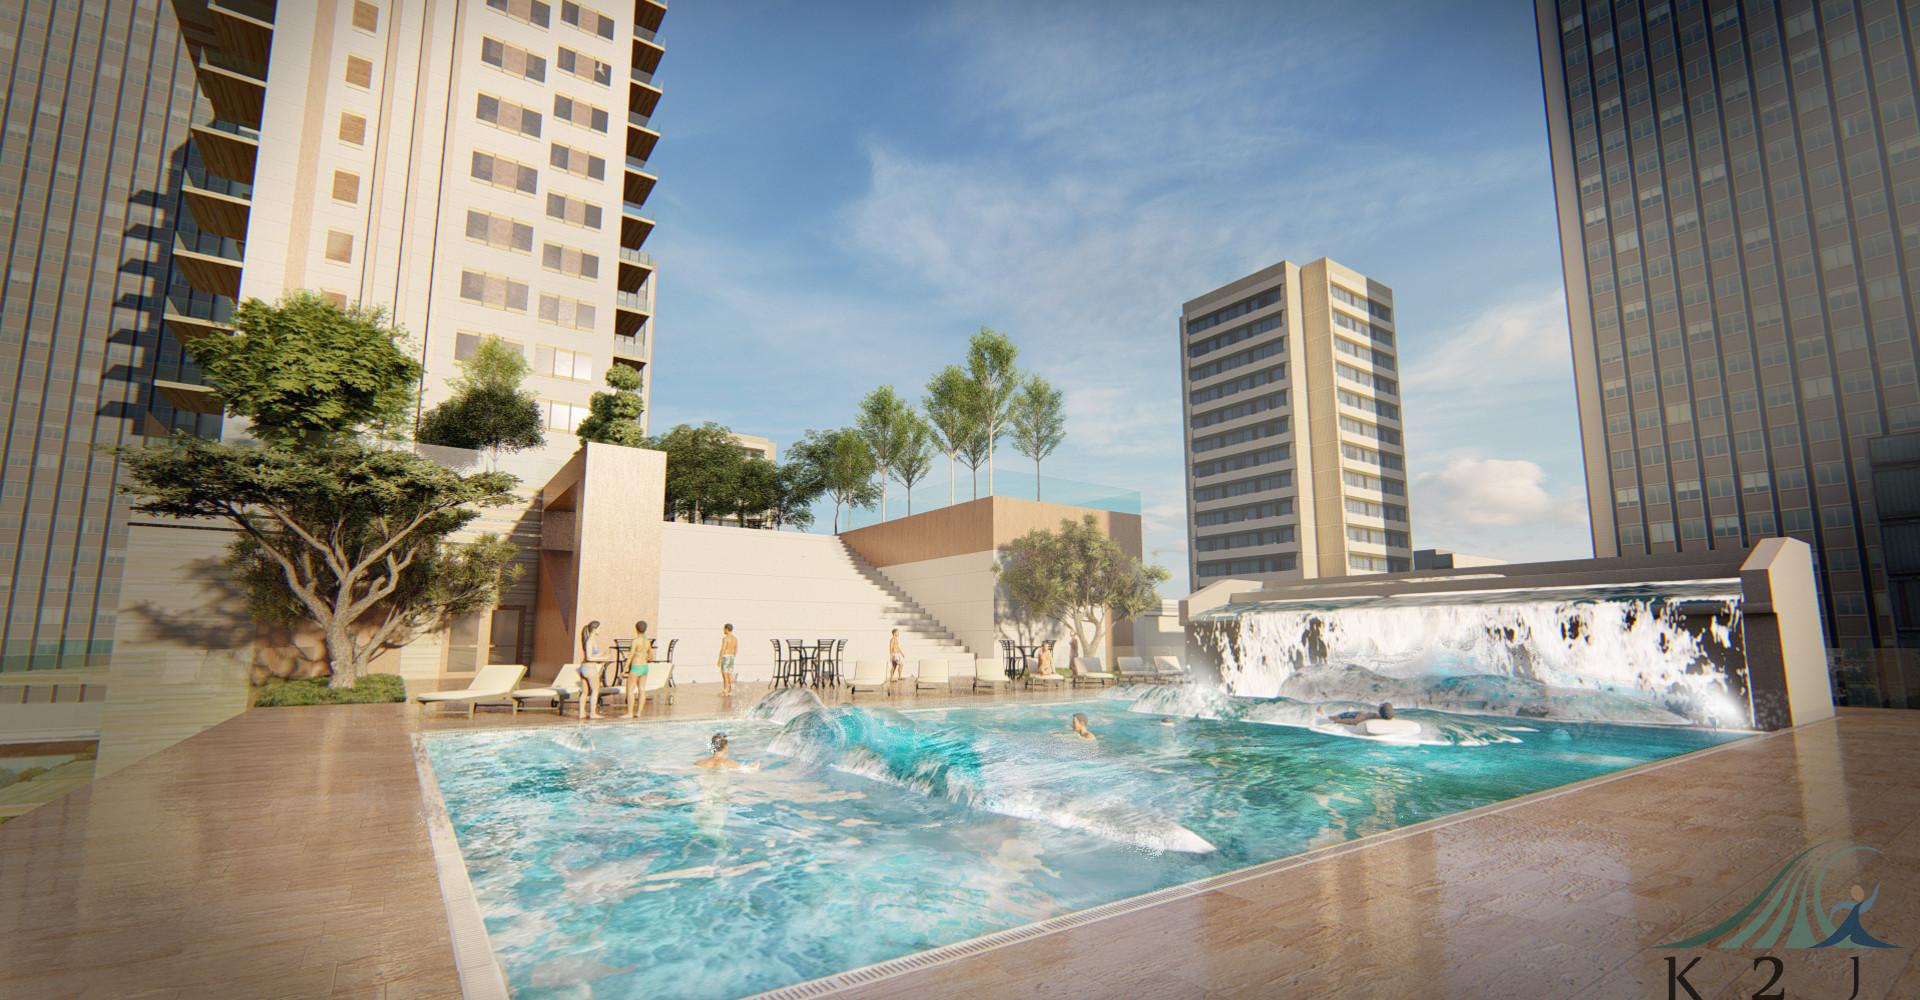 Wave pool บนดาดฟ้าอาคาร